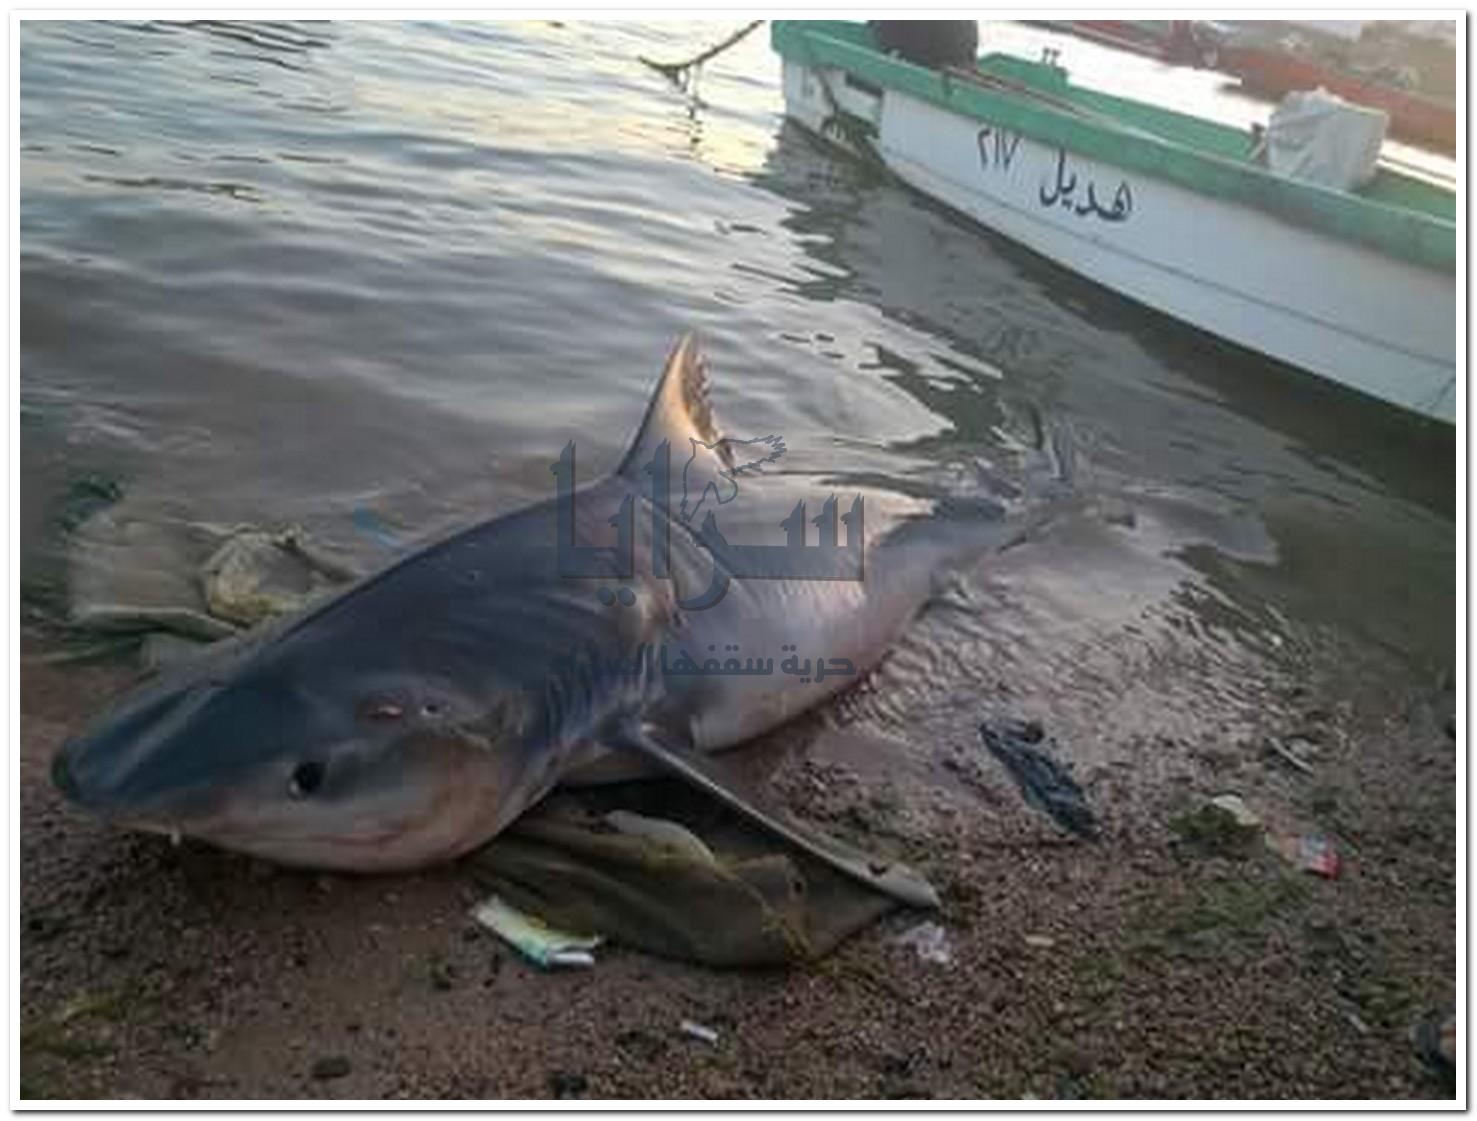 بالصور ..عقباوي يصطاد سمكة 10-05-2015